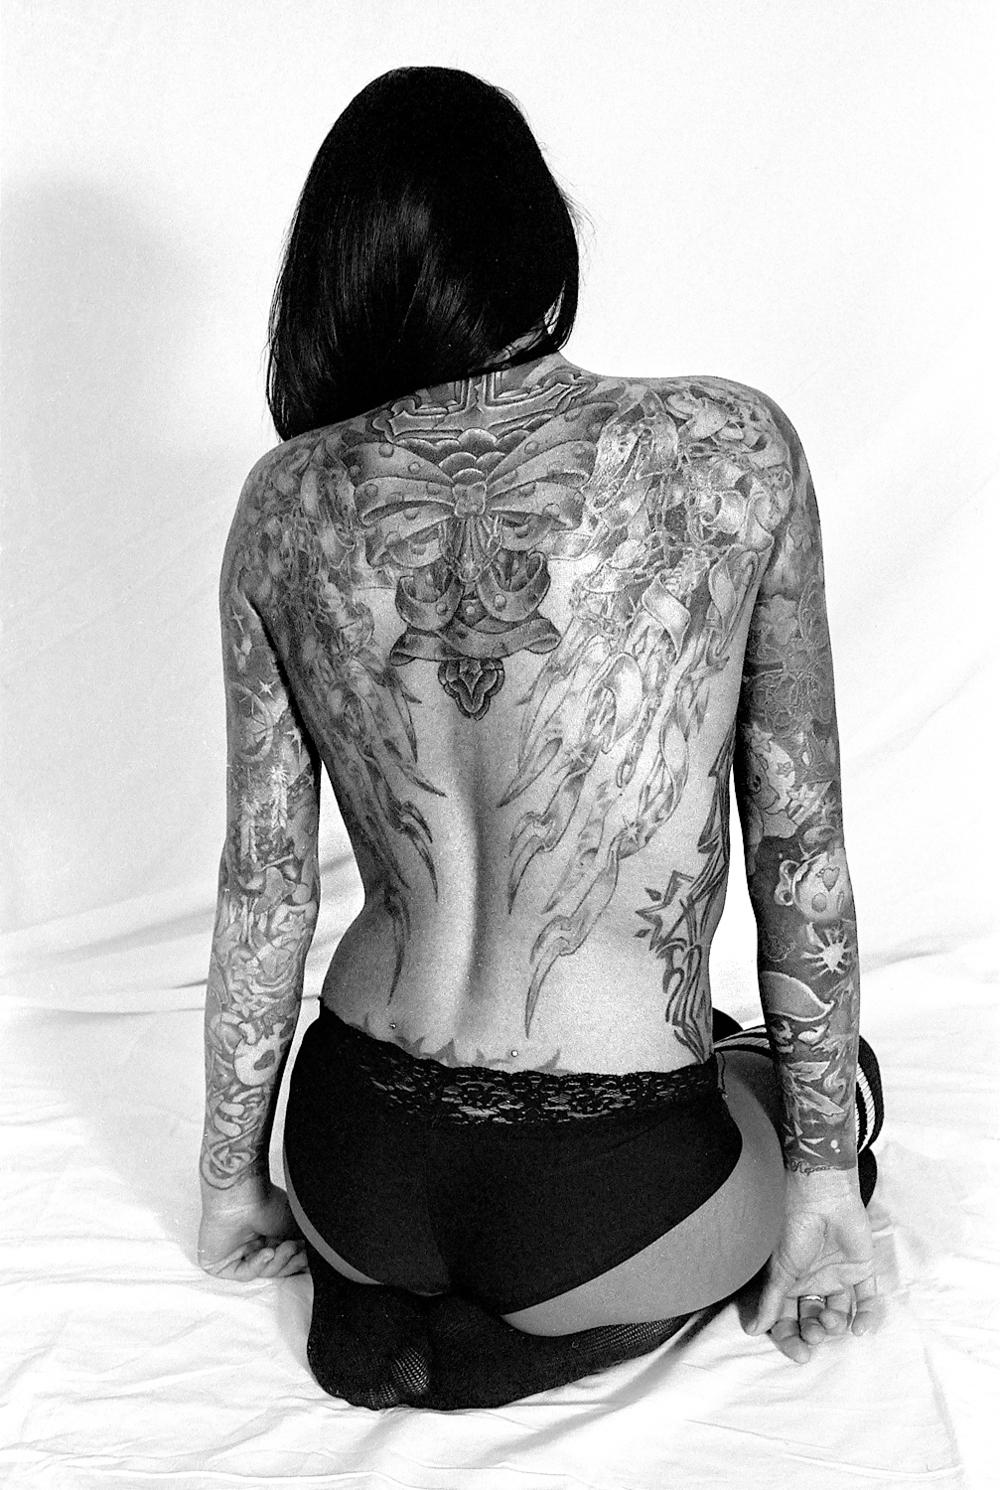 Lydia, the tattooed lady.